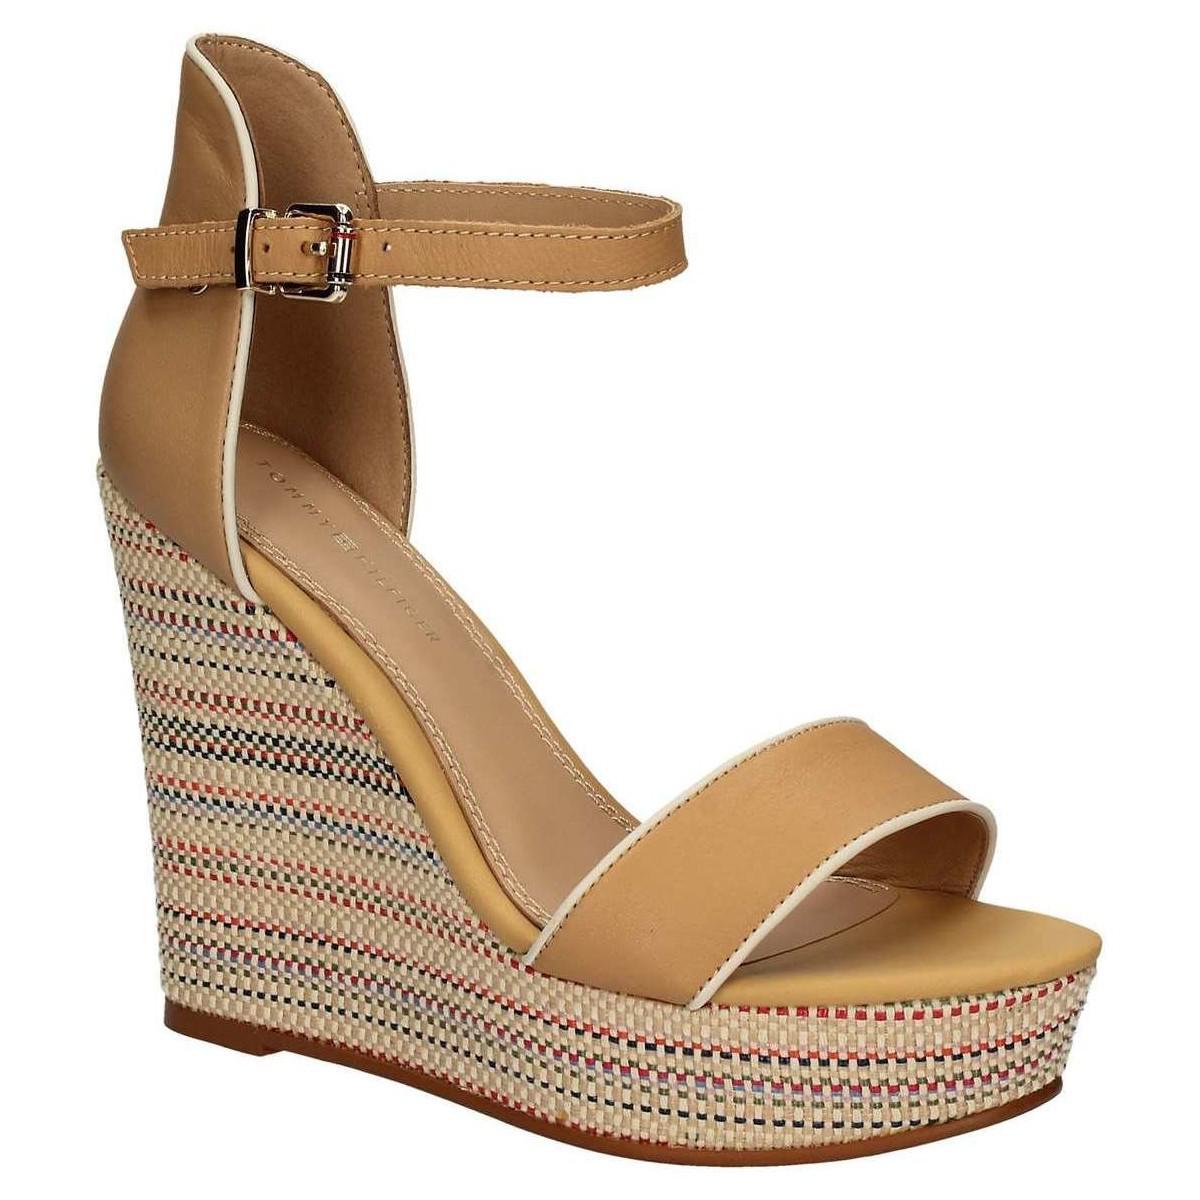 4c3658ad573 tommy-hilfiger-brown-Fw0fw01043-Wedge-Sandals-Women-Brown-Womens-Sandals -In-Brown.jpeg